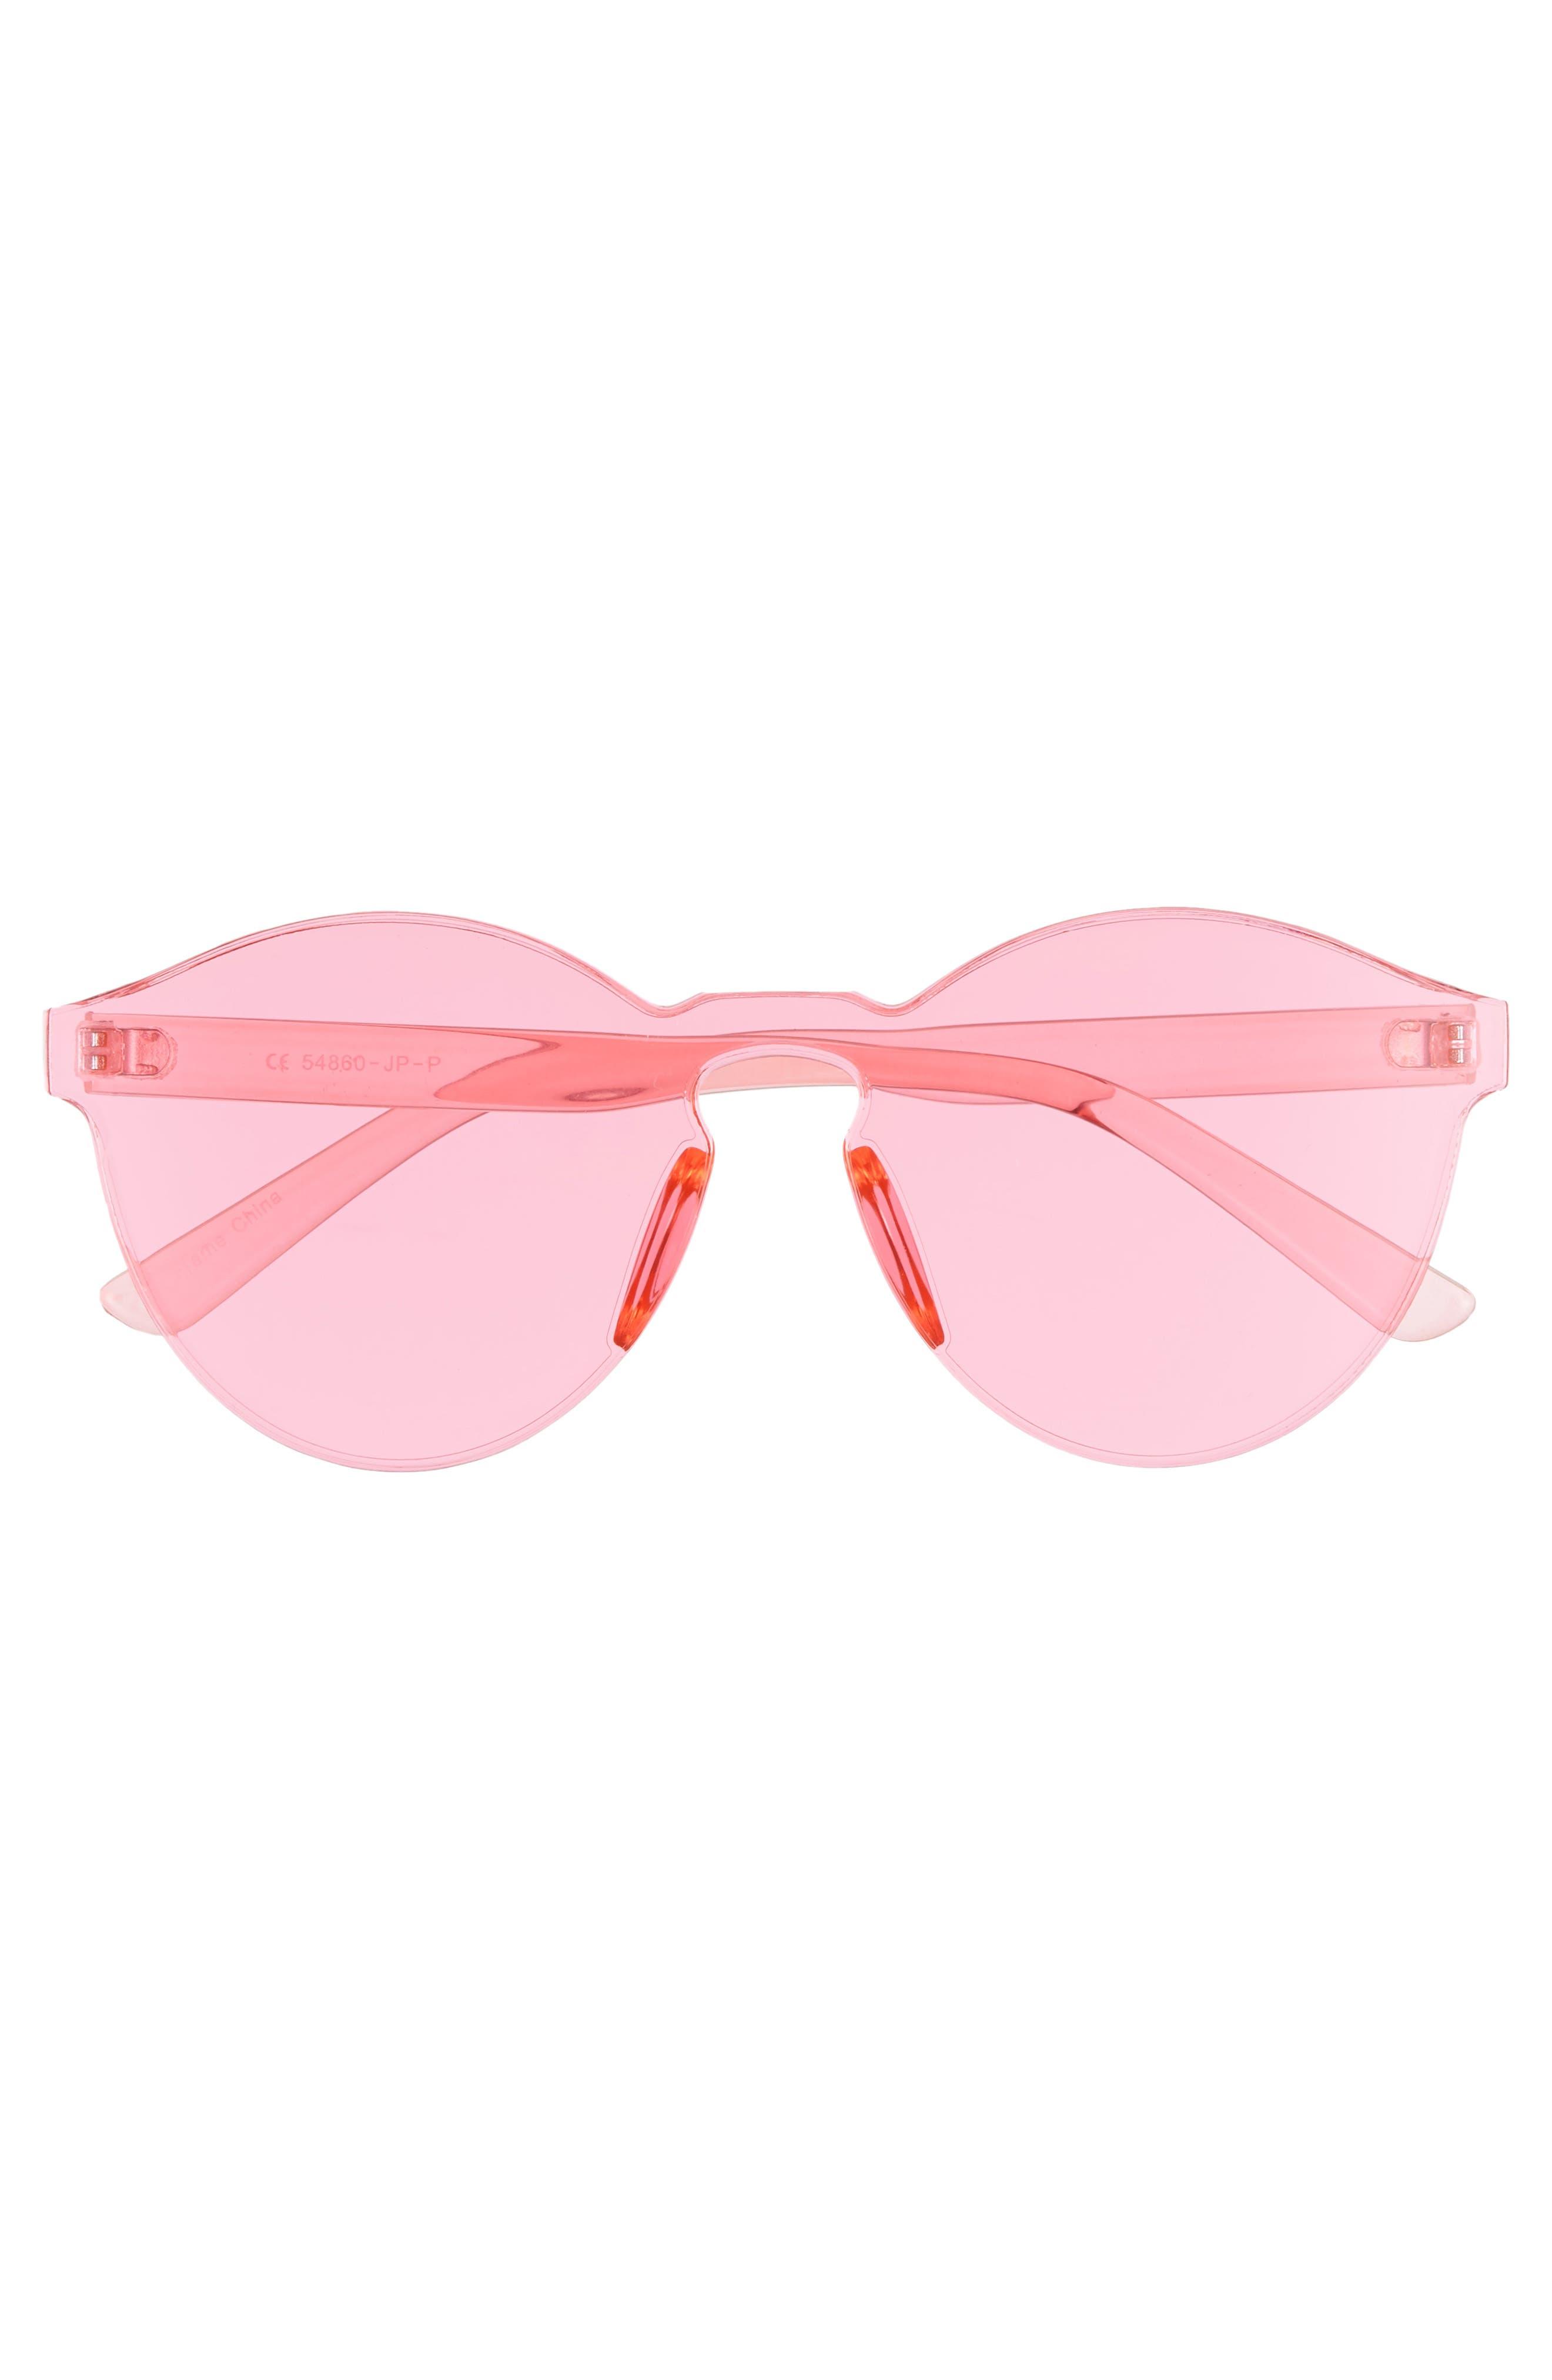 59mm Rimless Round Sunglasses,                             Alternate thumbnail 3, color,                             650